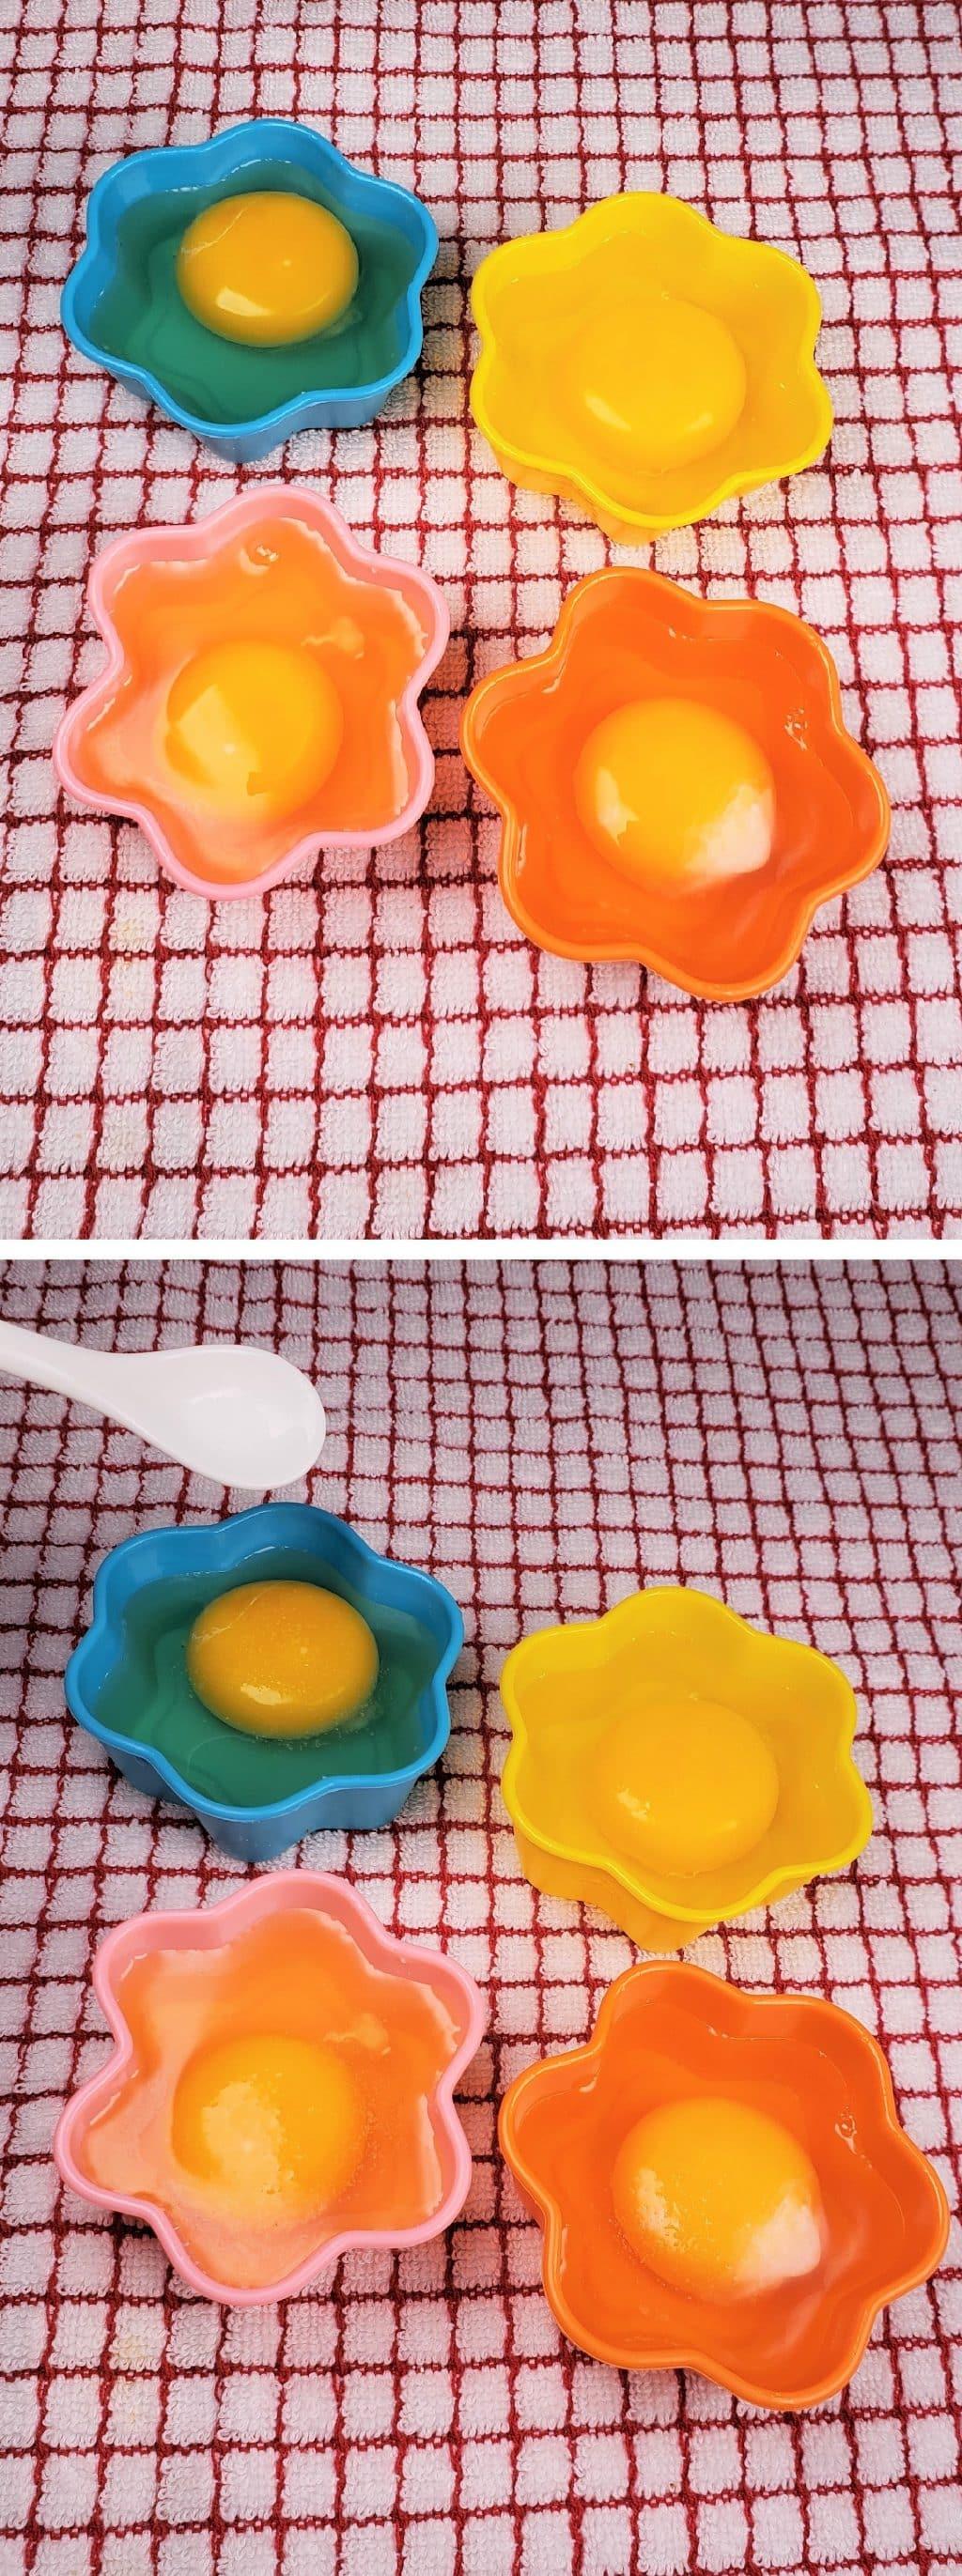 Crack Eggs into Poacher Cups